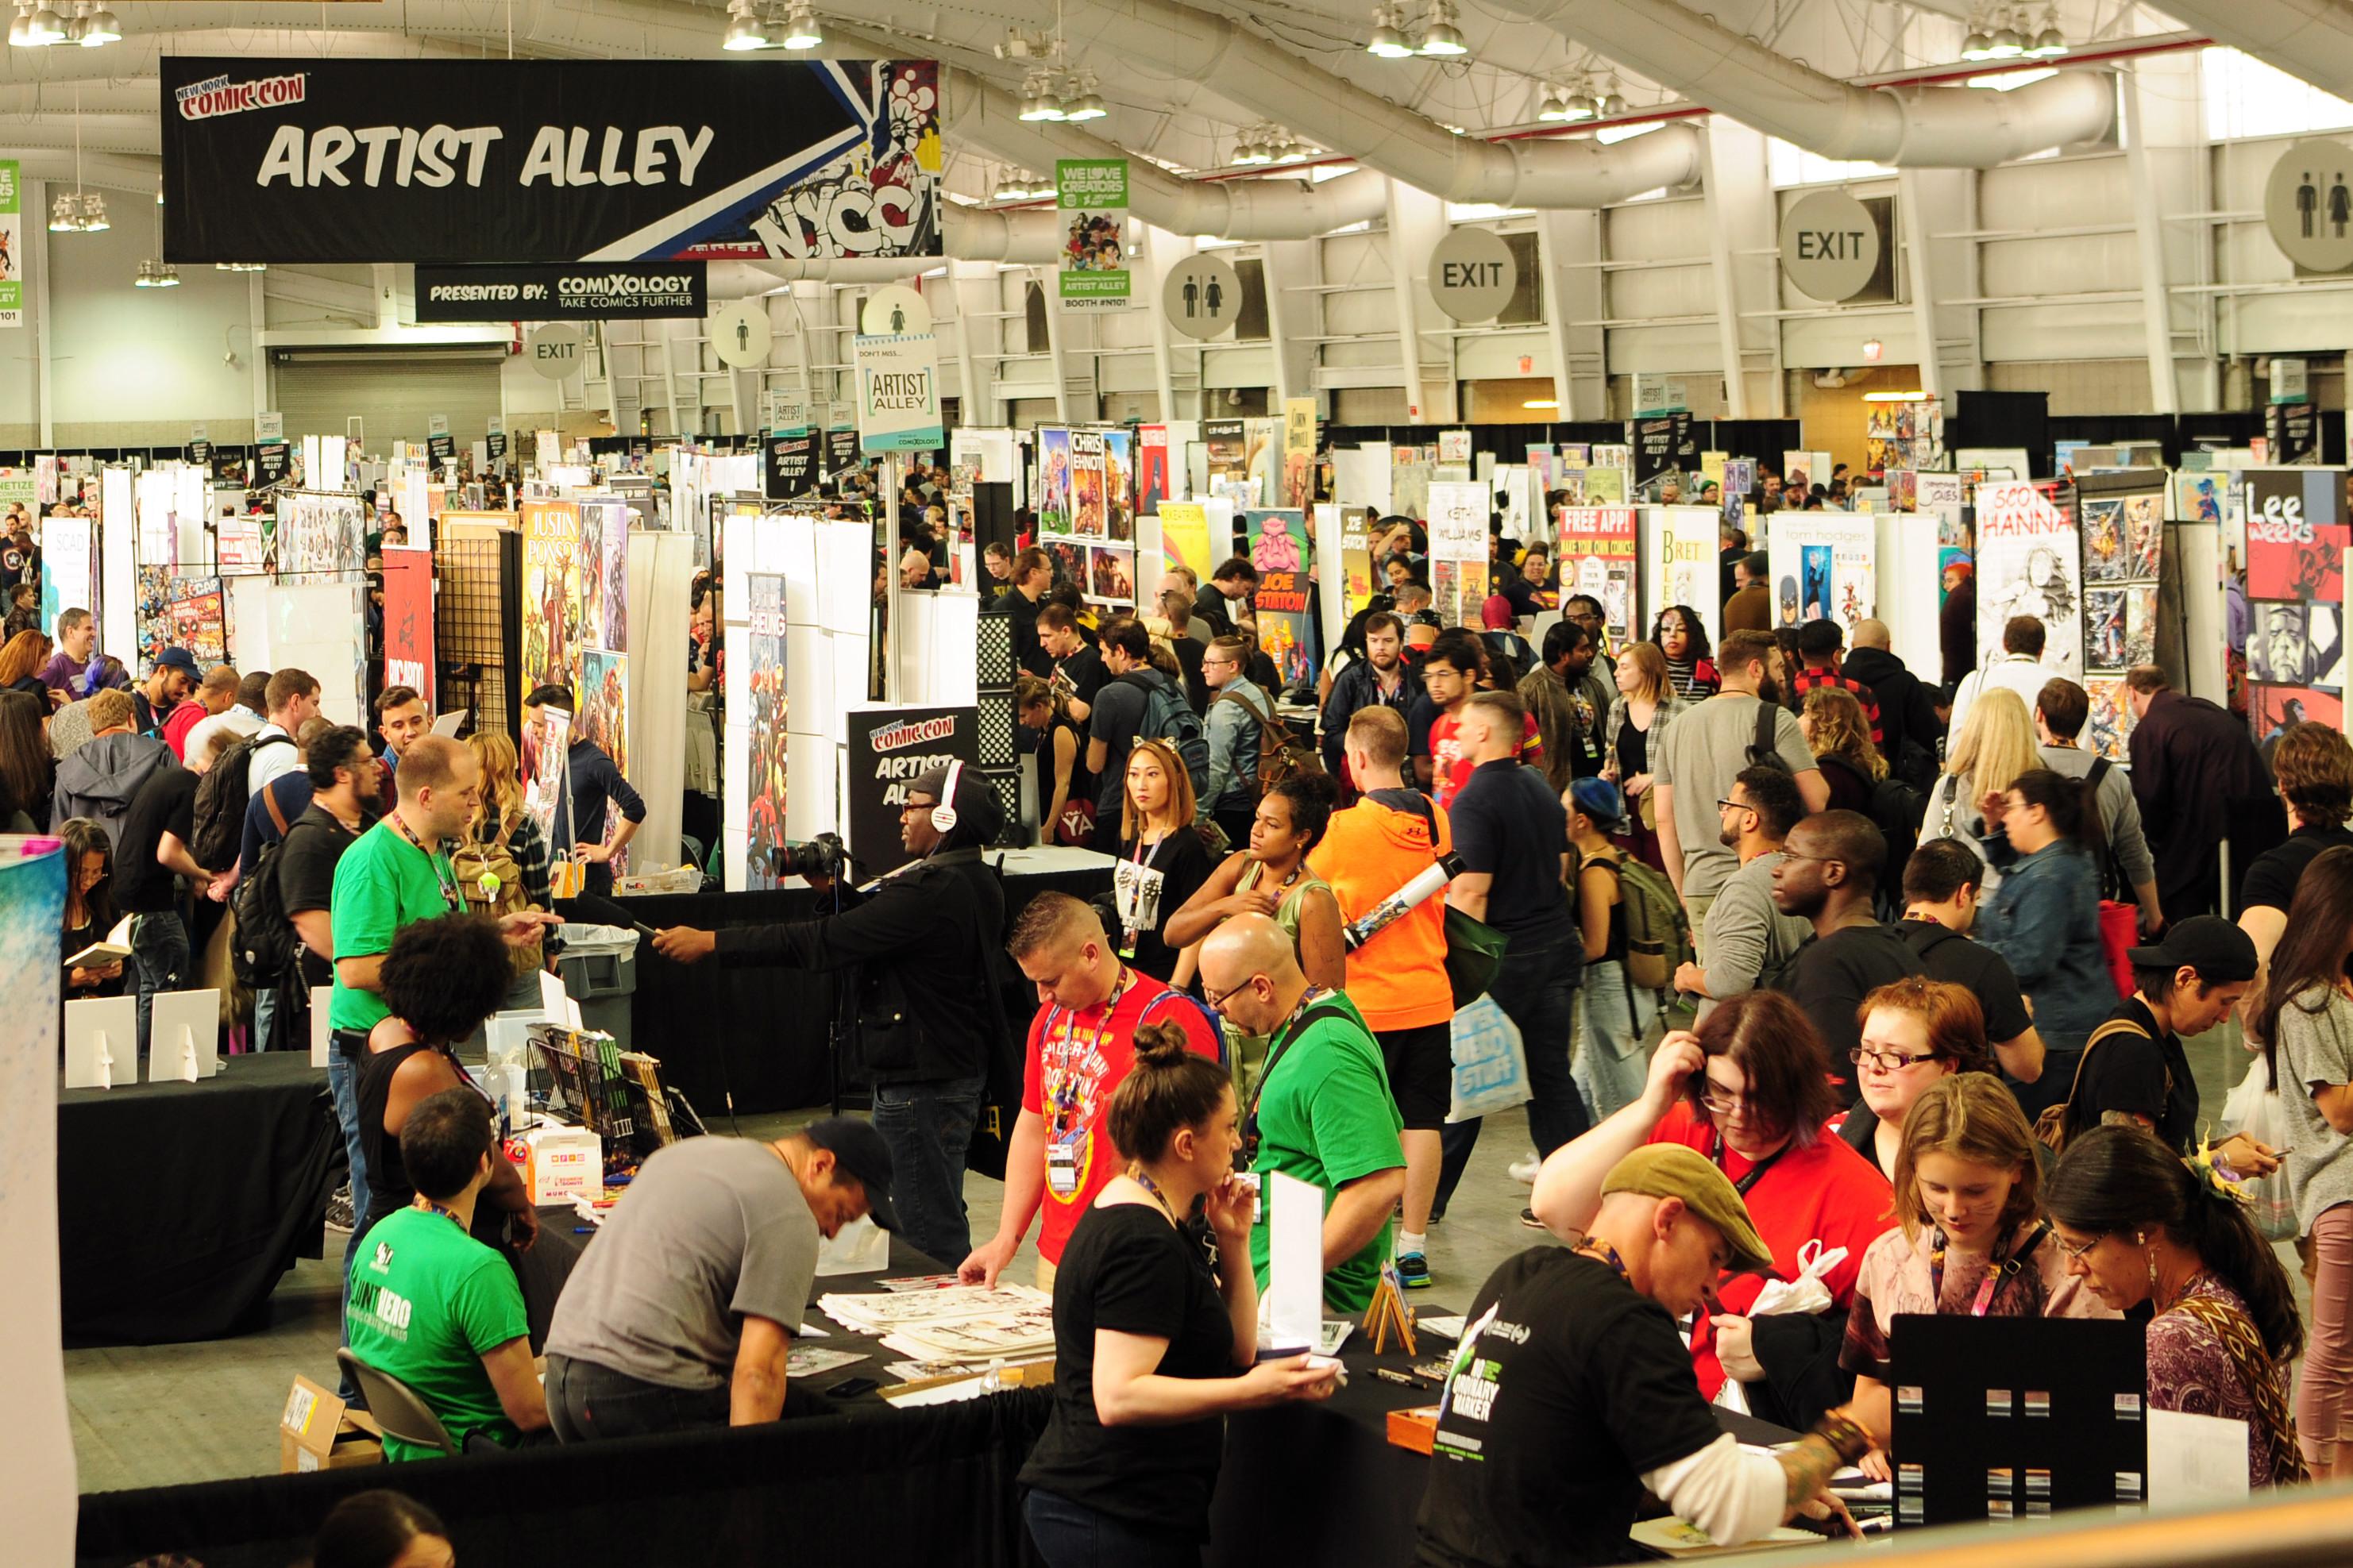 NYCC New York Comic Con Artist Alley